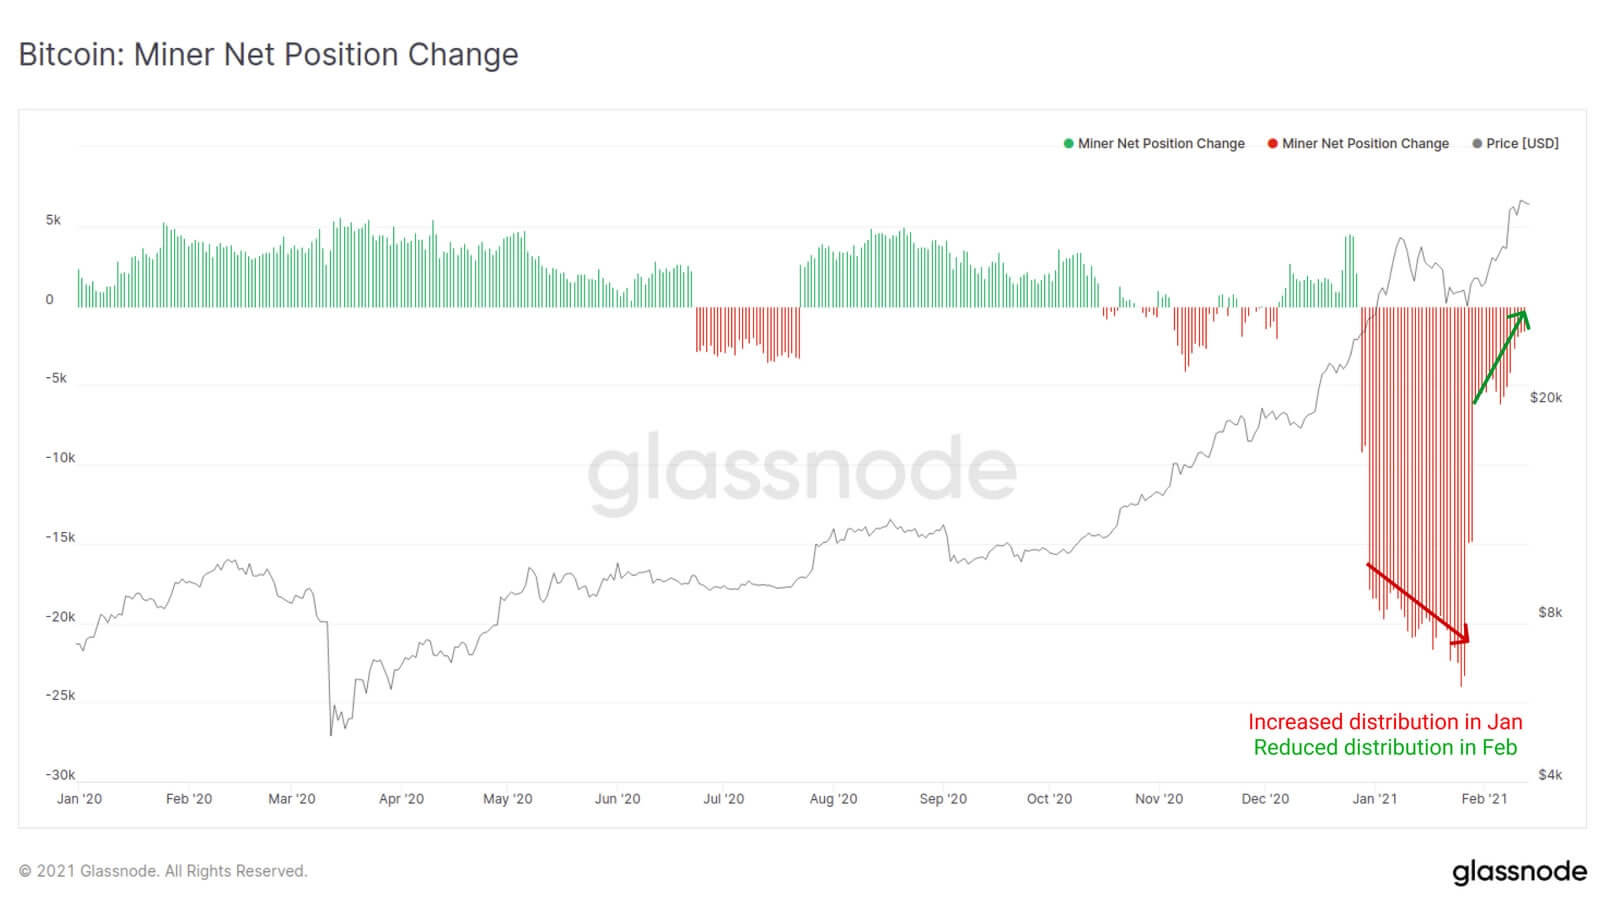 график майнеры Биткоин криптовалюта